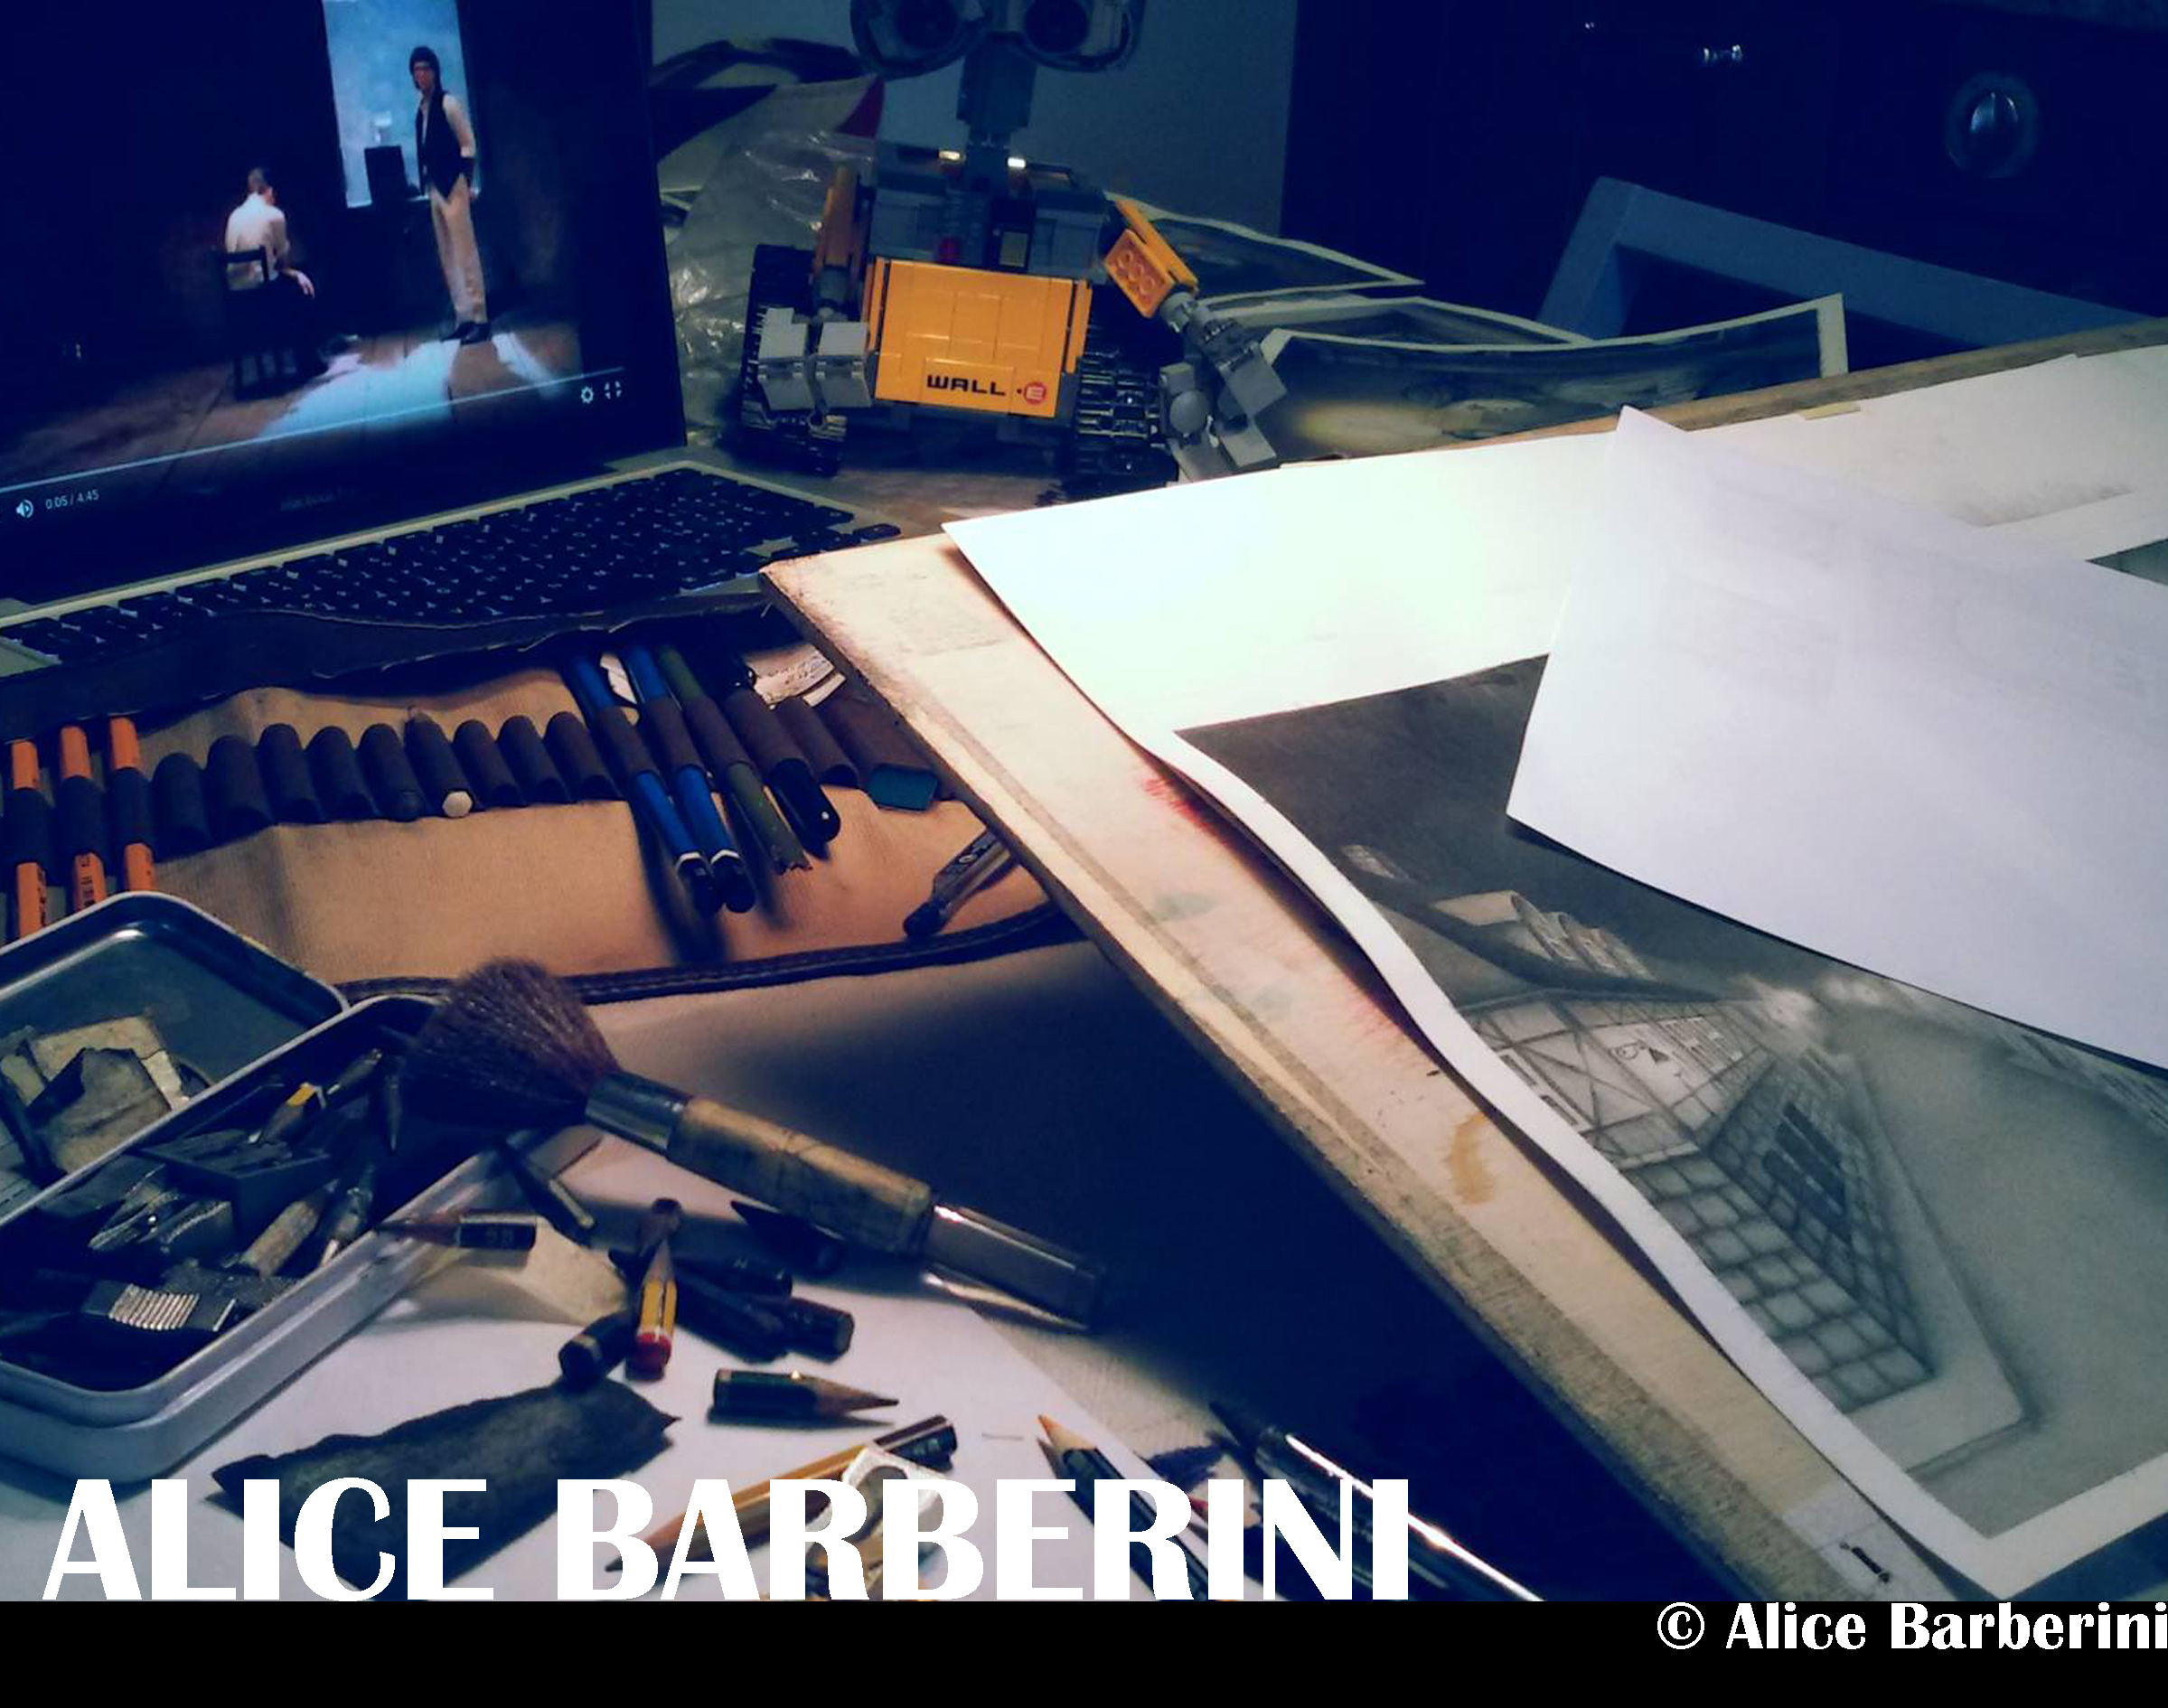 Alice Barberini